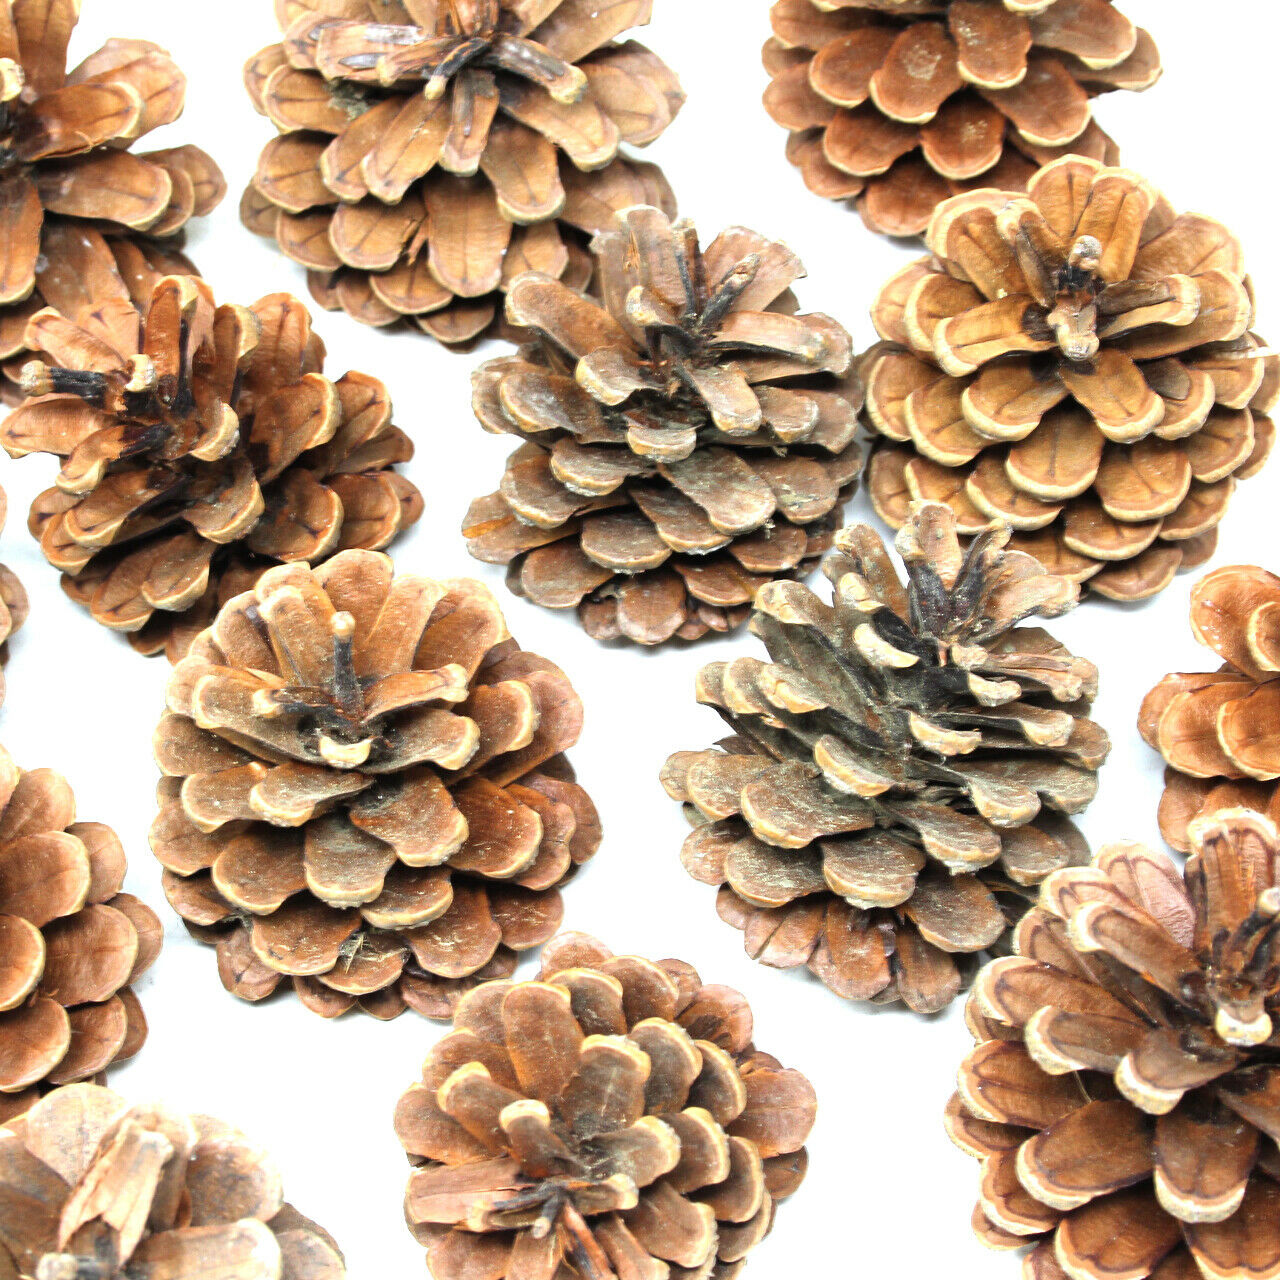 3-10kg quality natural pine cones florists,crafts,reaths